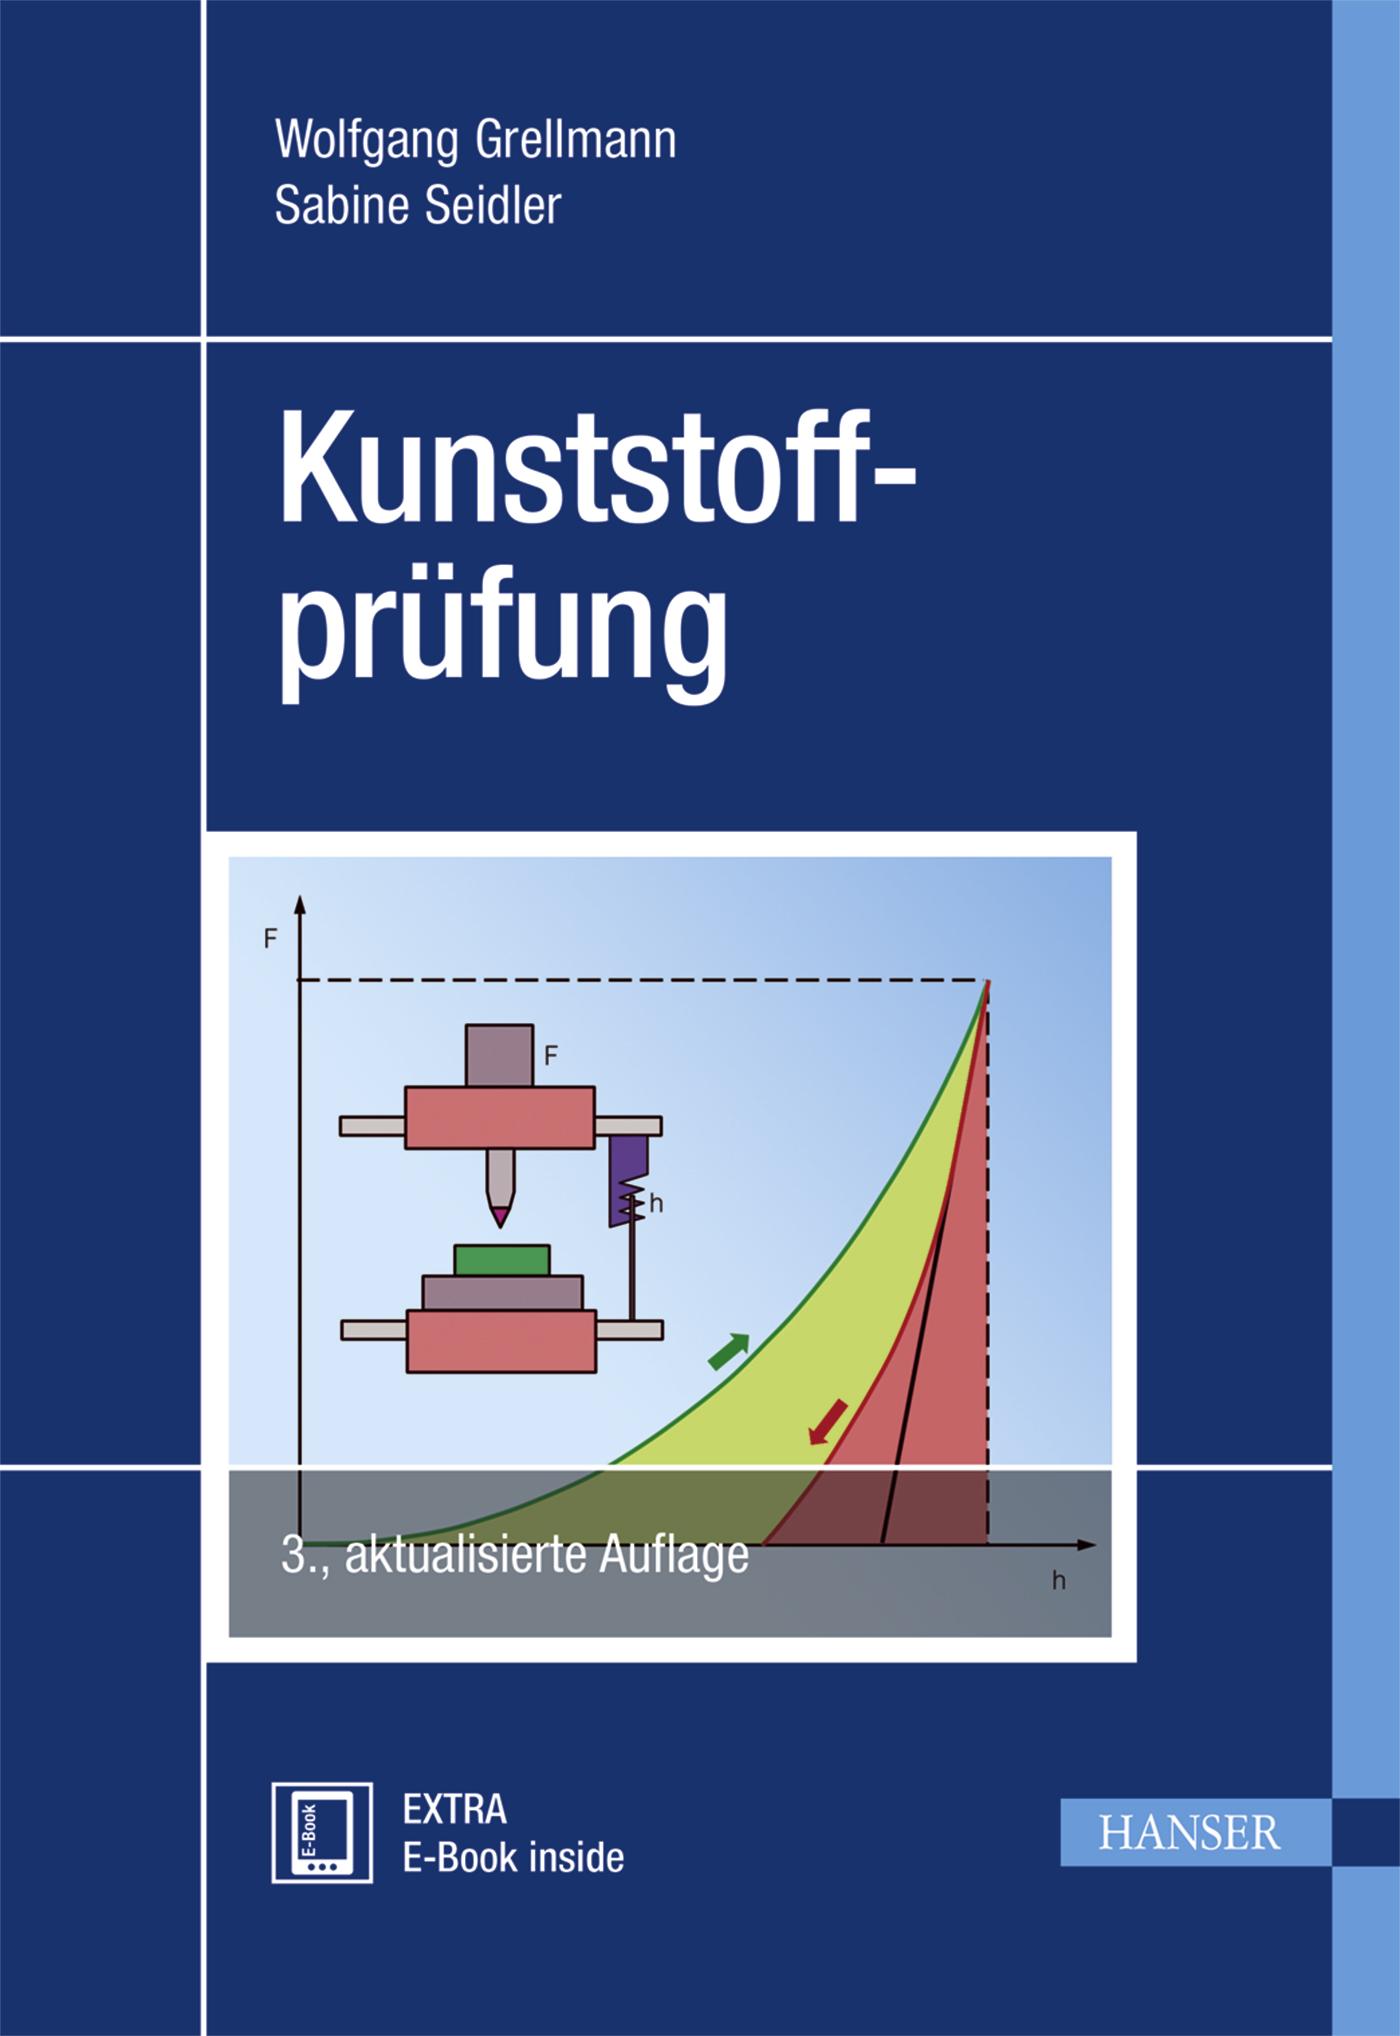 Grellmann, Seidler, Kunststoffprüfung, 978-3-446-44350-1